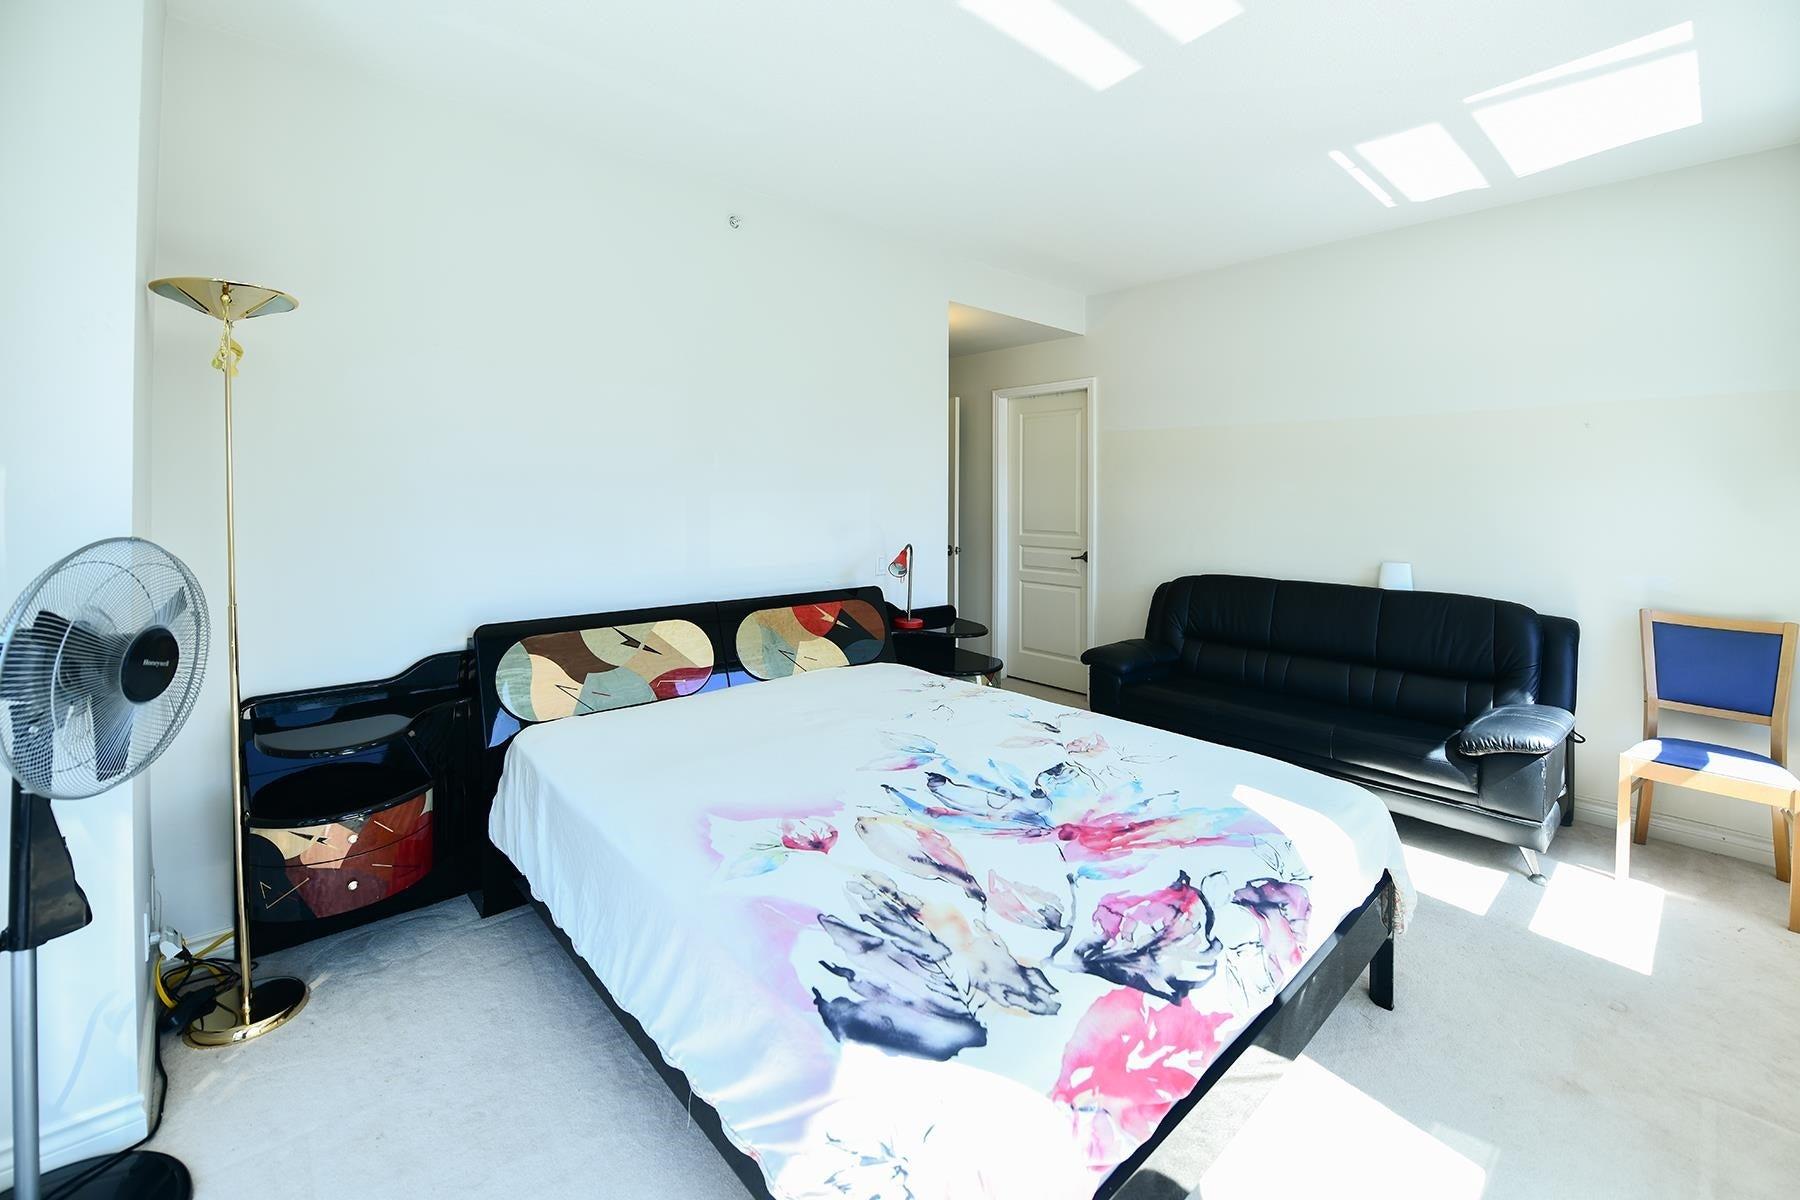 204 5790 EAST BOULEVARD - Kerrisdale Apartment/Condo for sale, 3 Bedrooms (R2604138) - #13